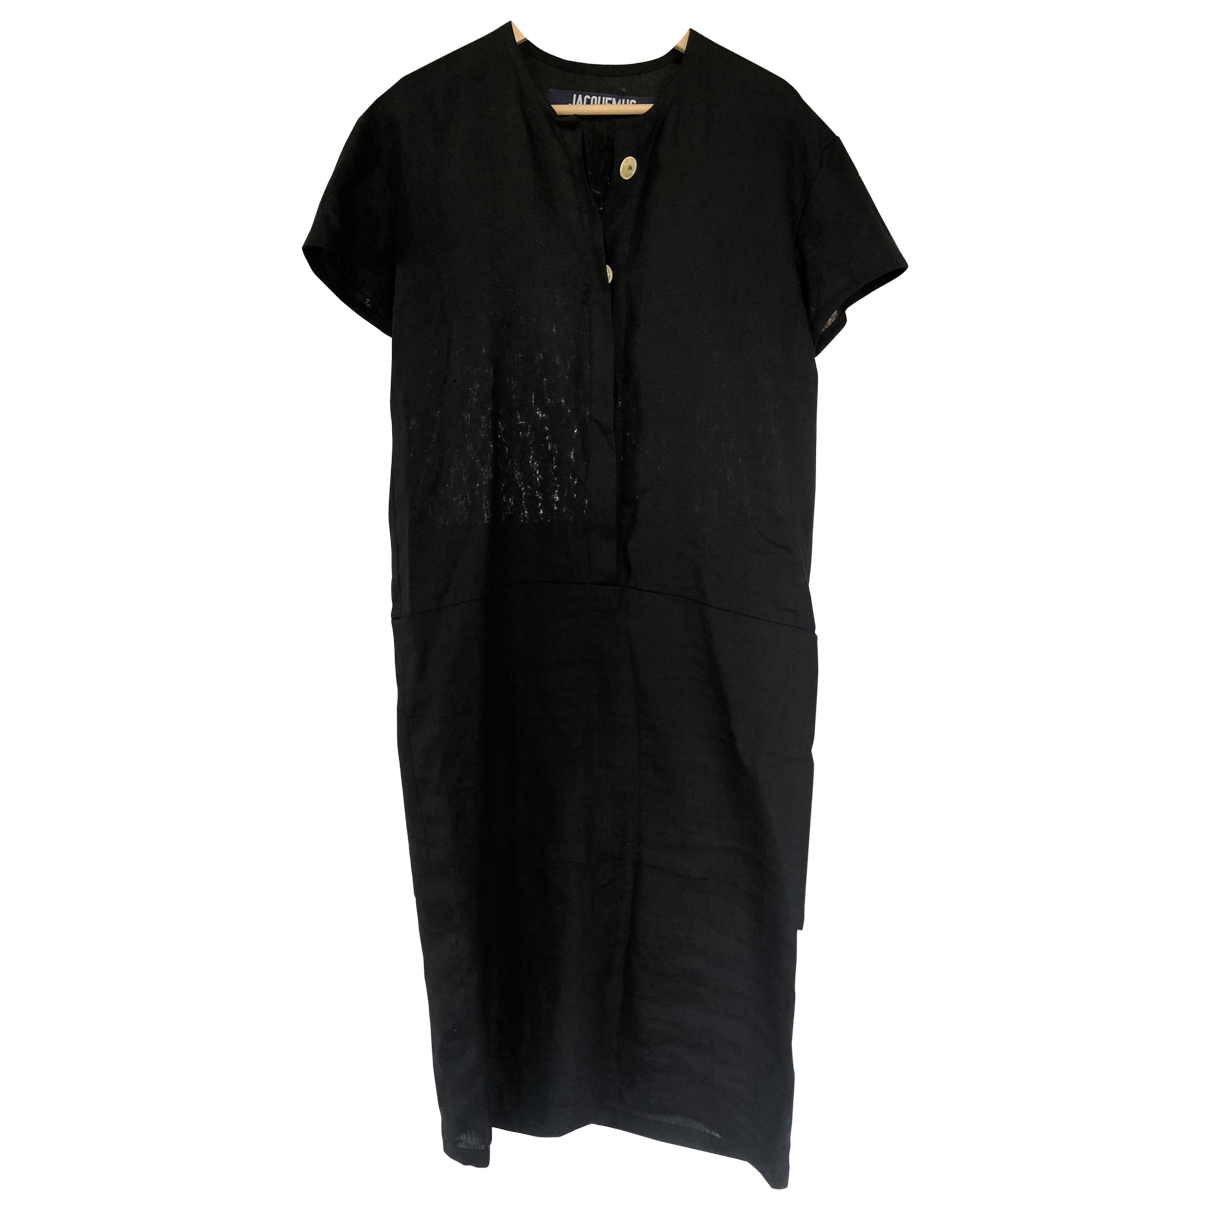 Jacquemus Le Chenil Black Linen dress for Women 36 FR